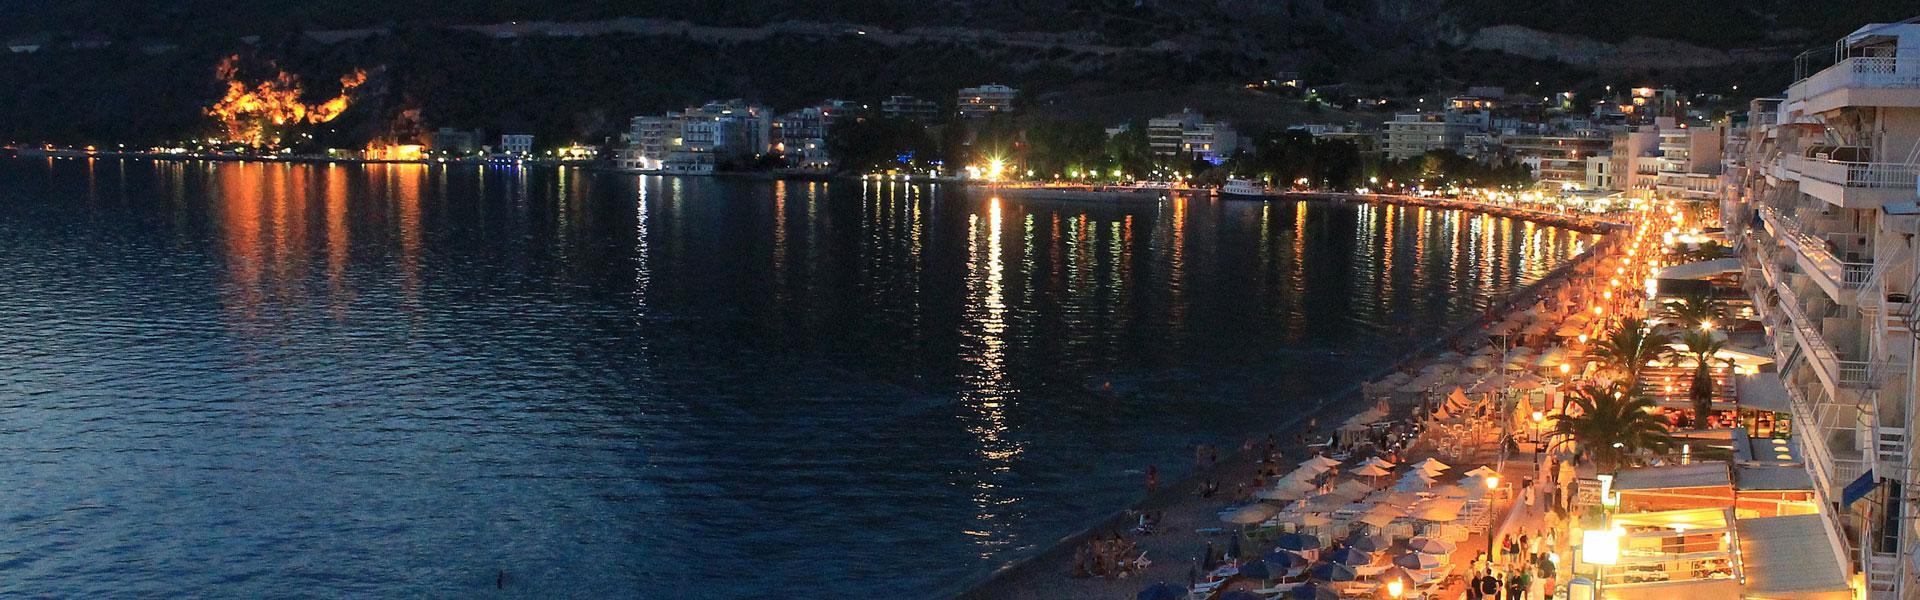 Loutraki night view